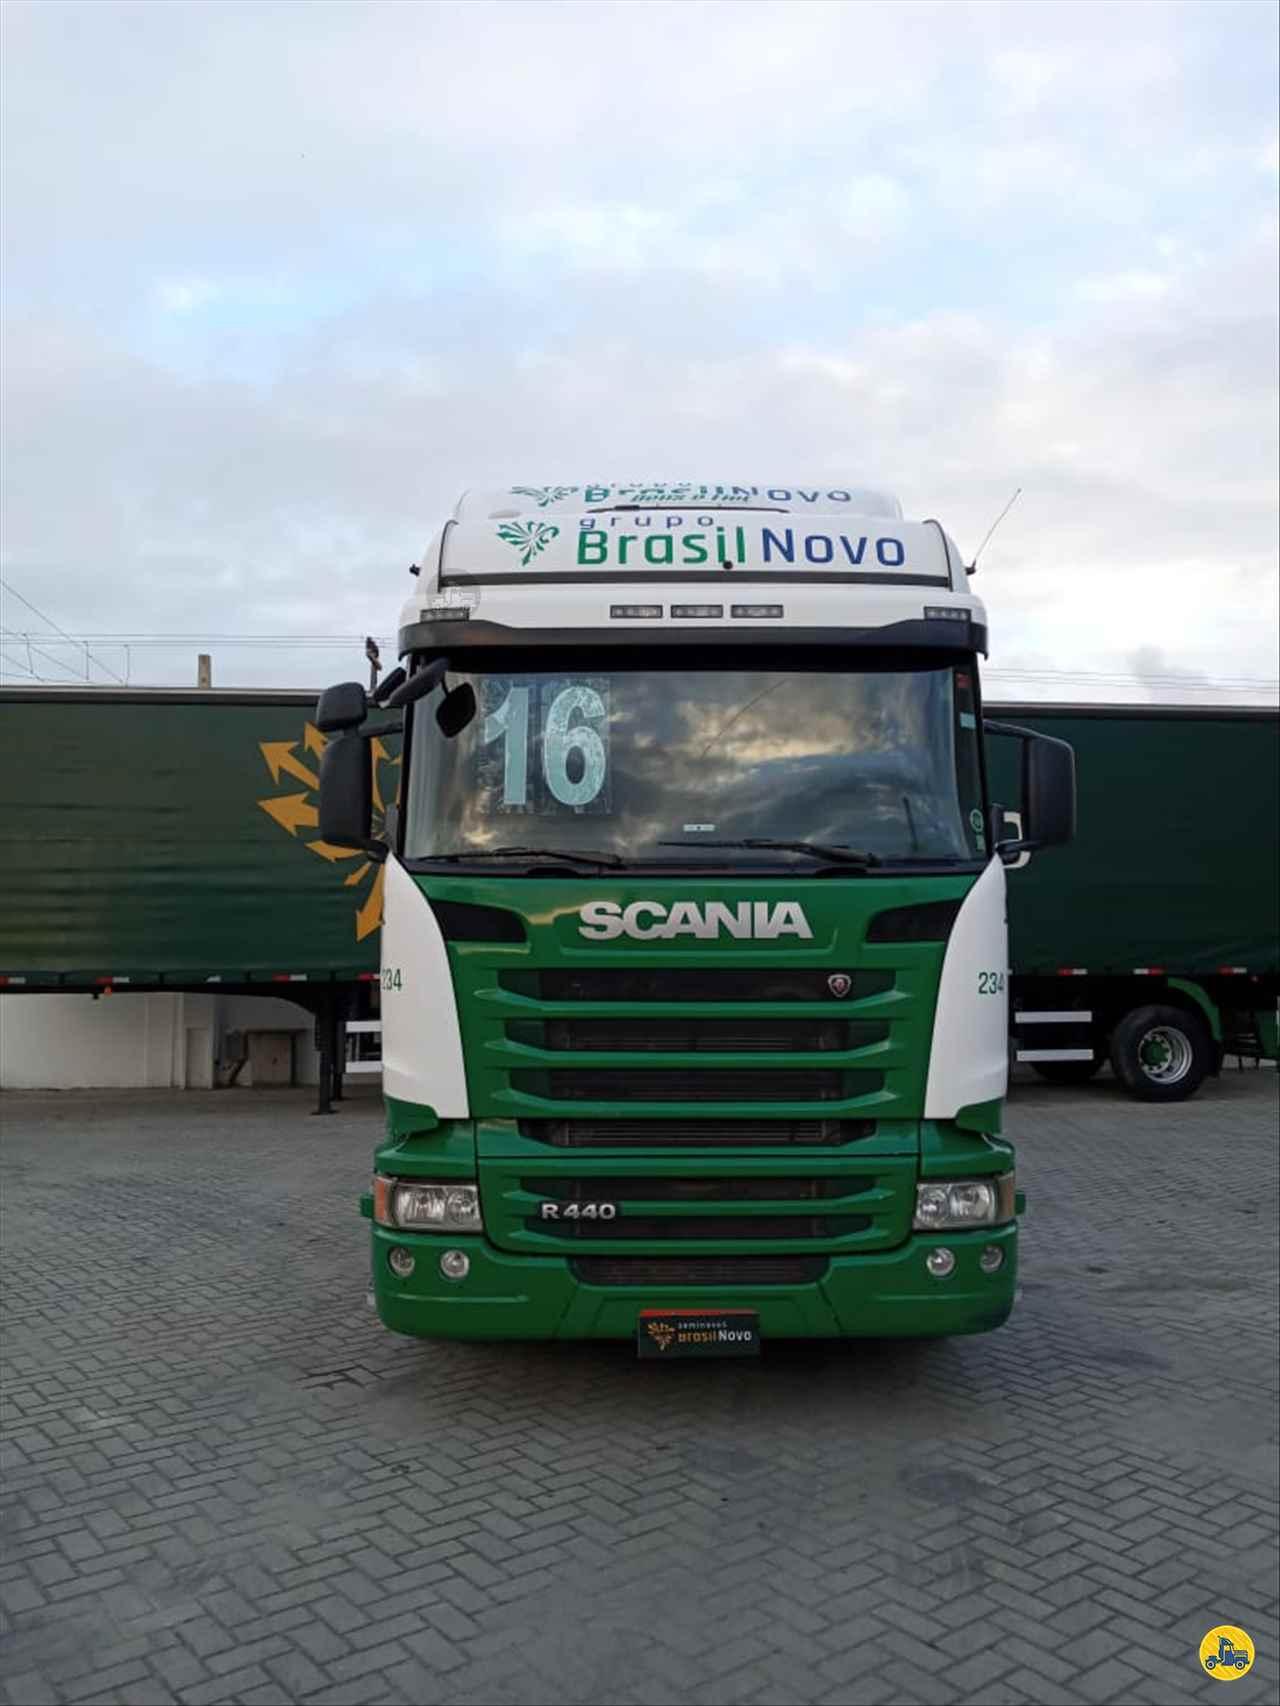 CAMINHAO SCANIA SCANIA 440 Cavalo Mecânico Truck 6x2 Brasil Novo Seminovos TIJUCAS SANTA CATARINA SC